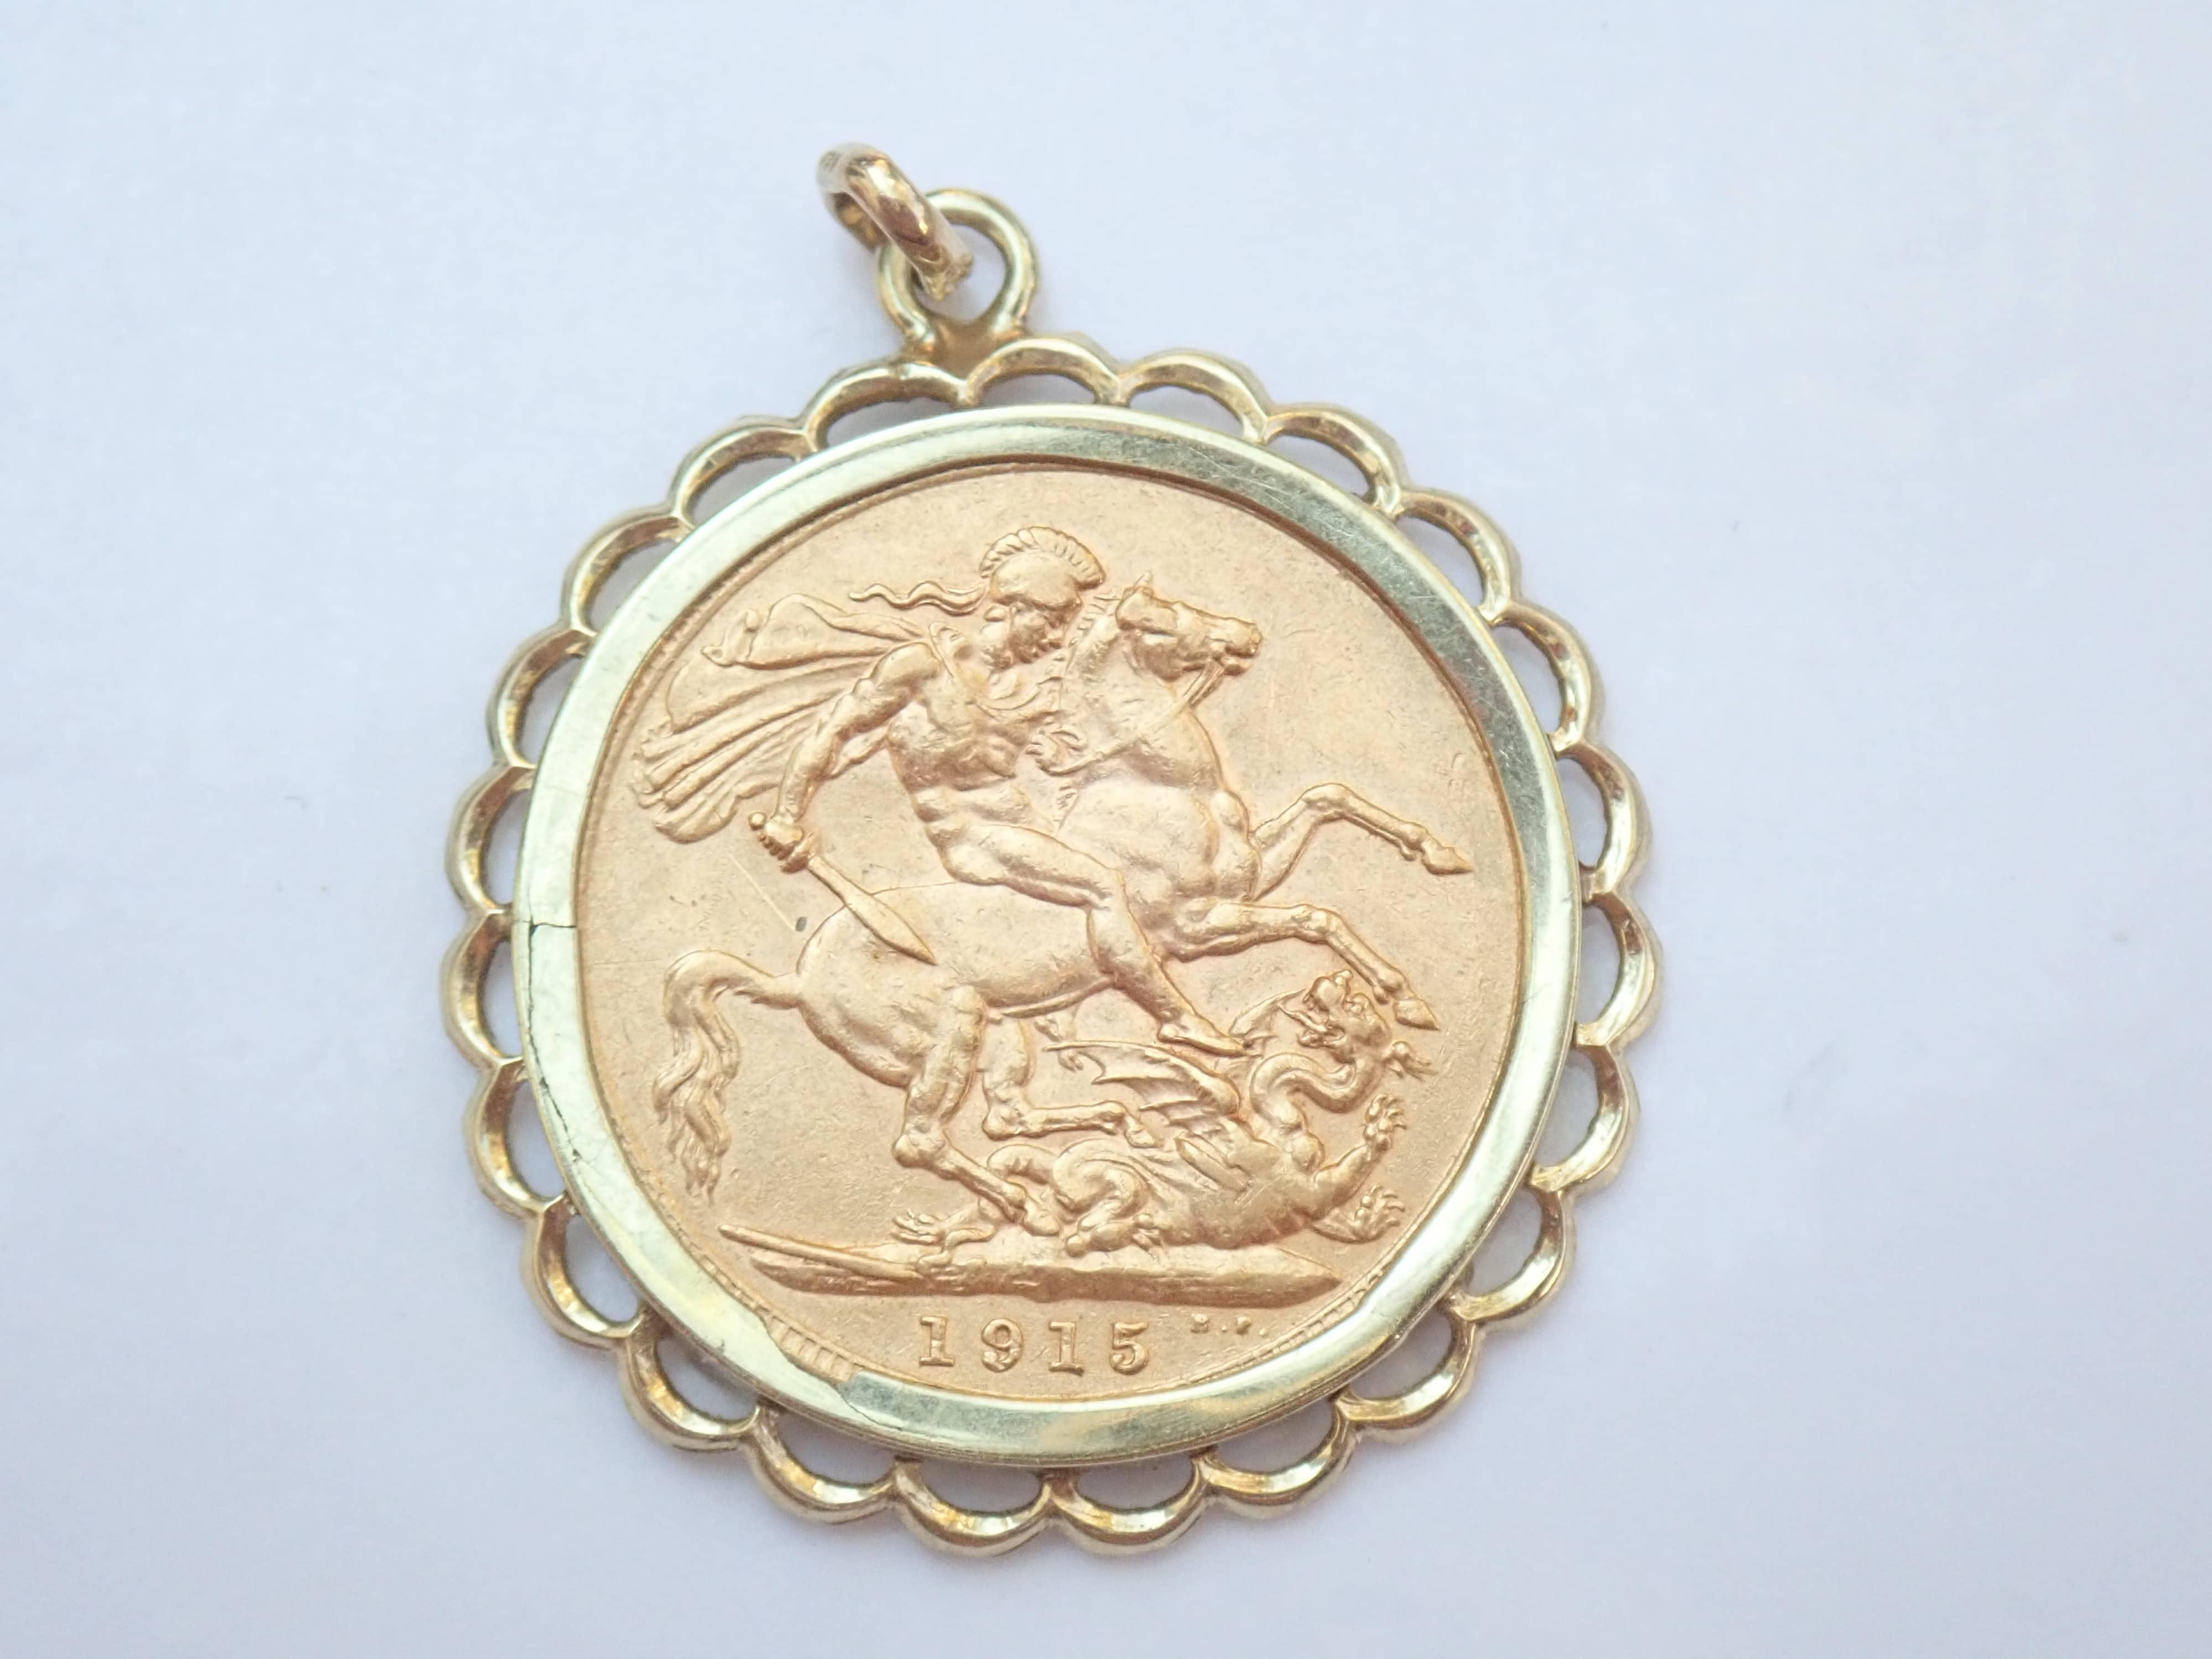 1915 Gold Full Sovereign Pendant No Chain – King George V -8.2gms #405